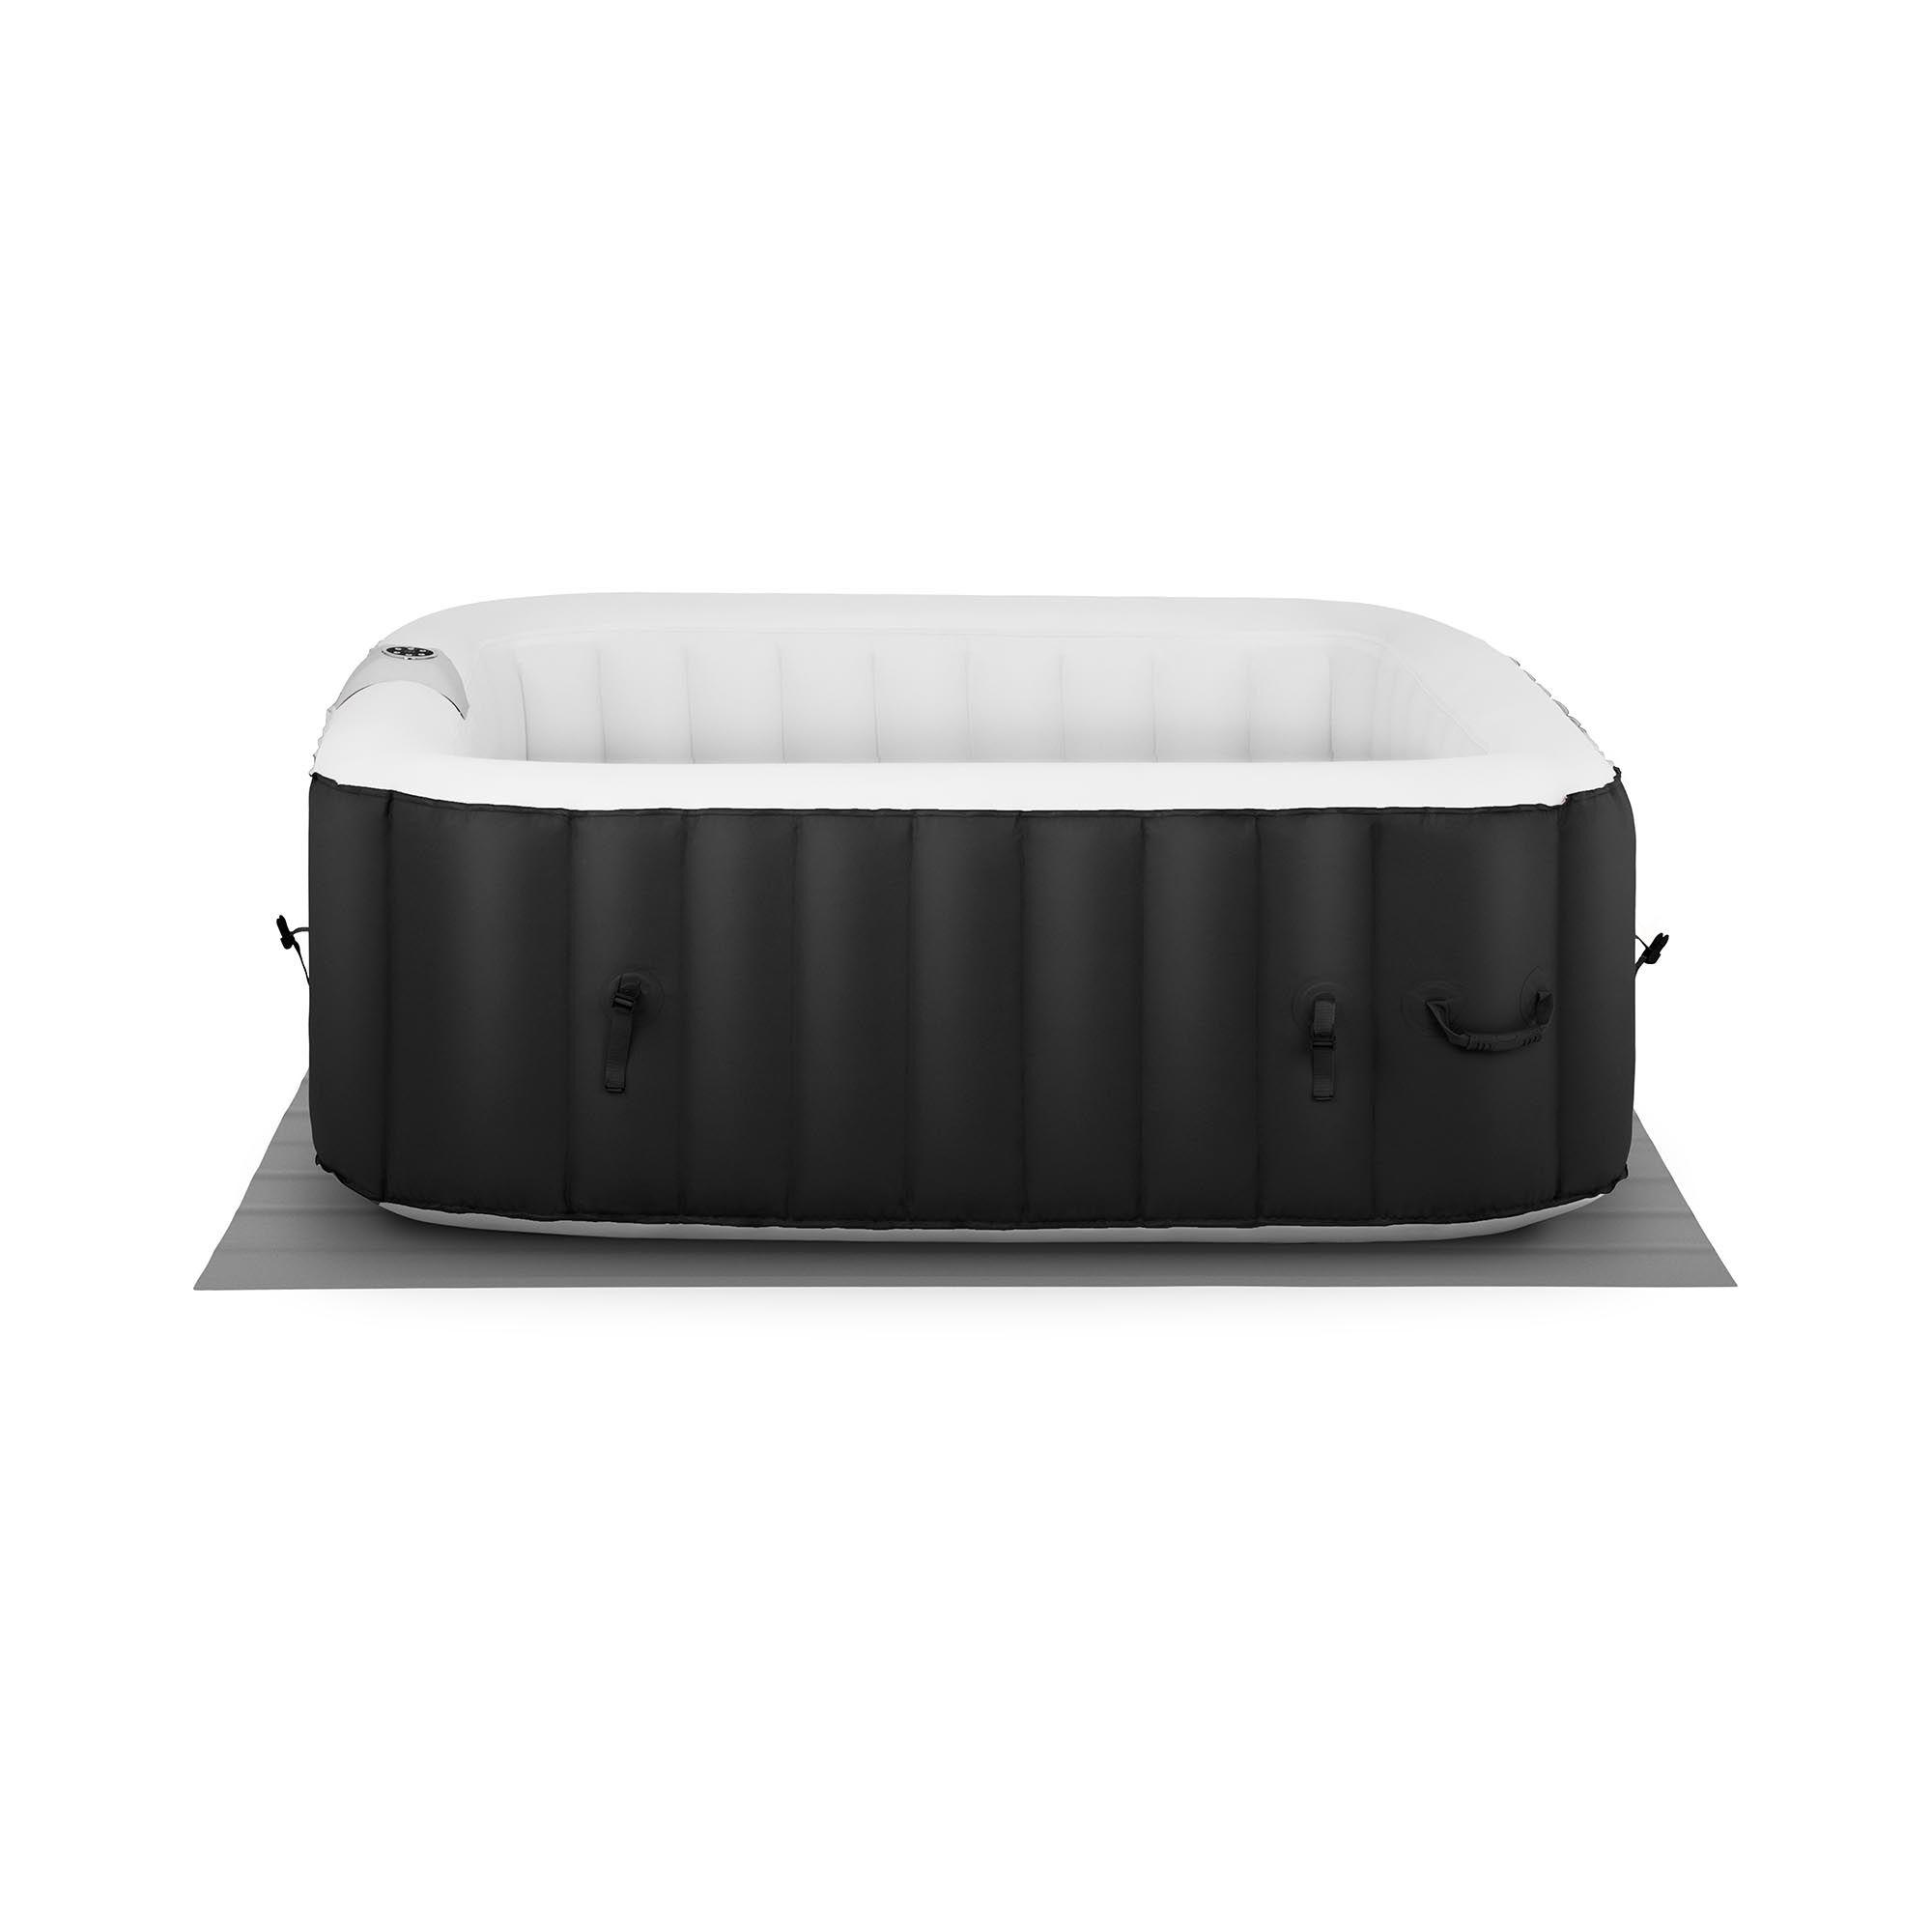 Uniprodo Oppustelig spa - 600 l - 4 personer - 100 dyser UNI_POOLS_15